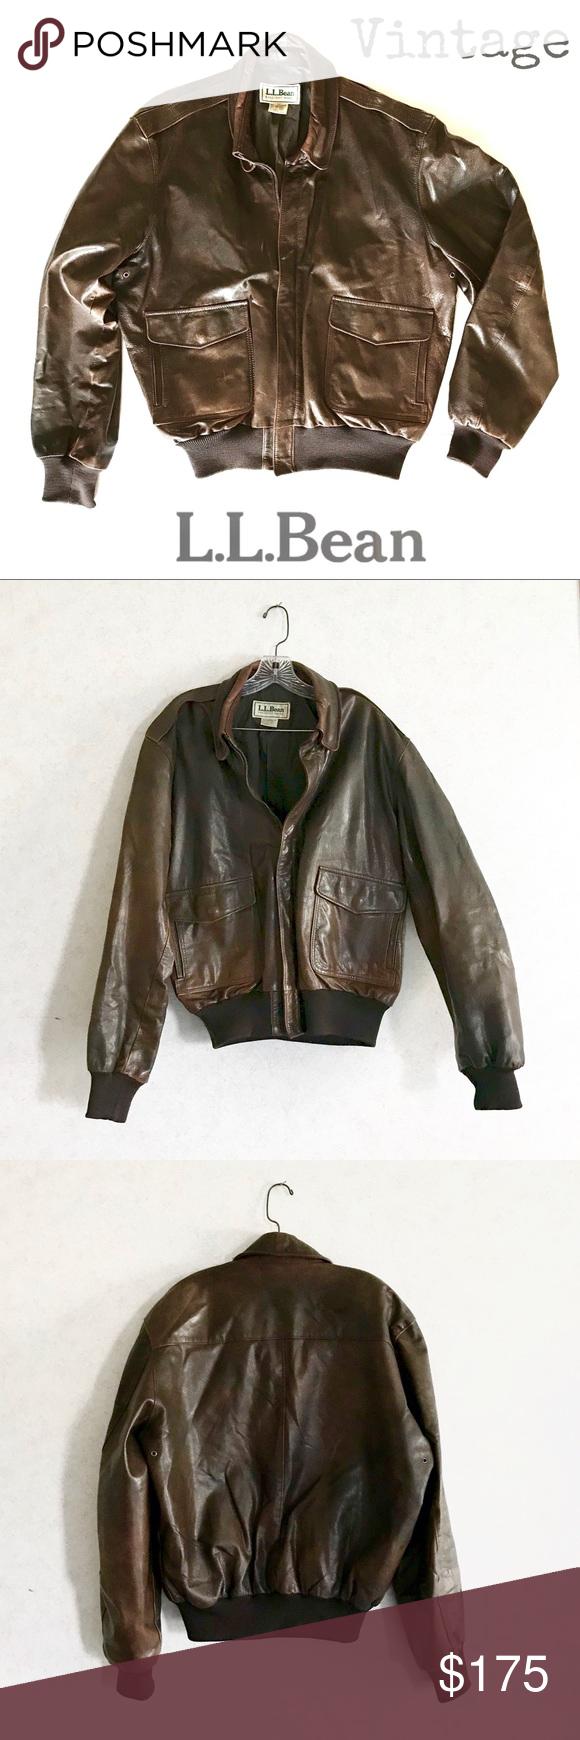 Vintage L L Bean Men S Leather Bomber Jacket Bomber Jacket Vintage Leather Bomber Jacket Mens Leather Bomber Jacket